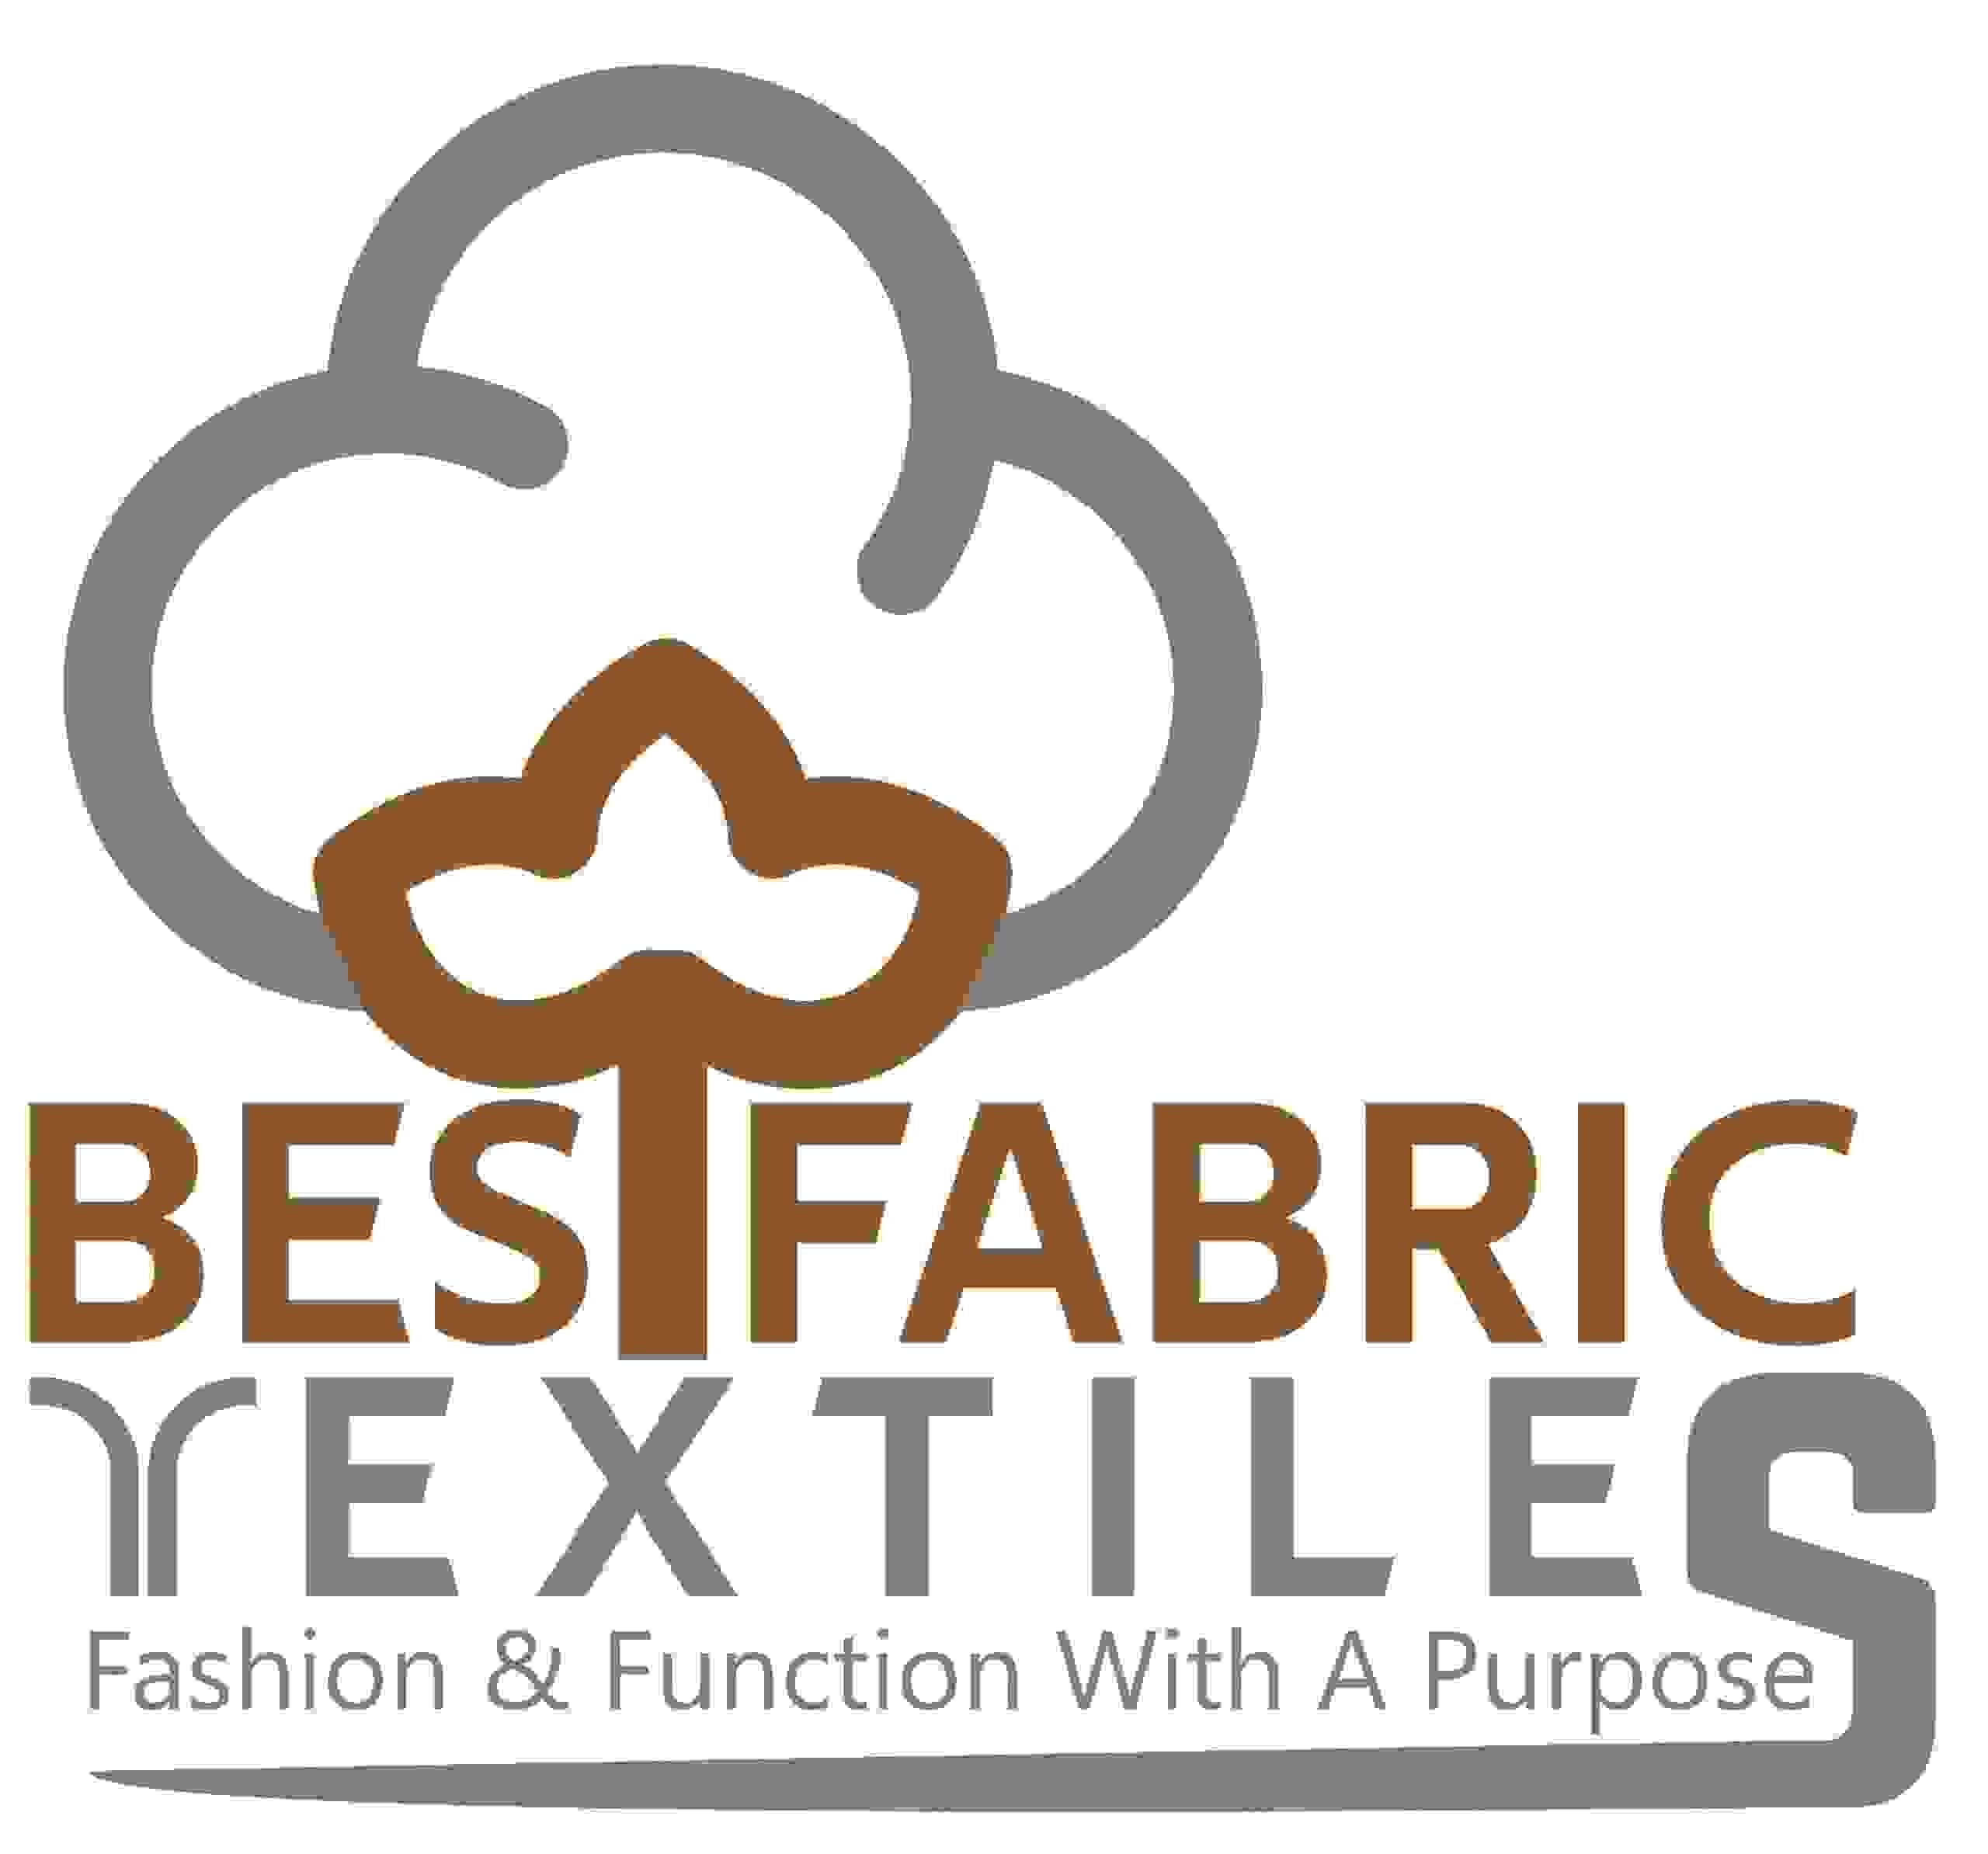 BestFabricTextiles